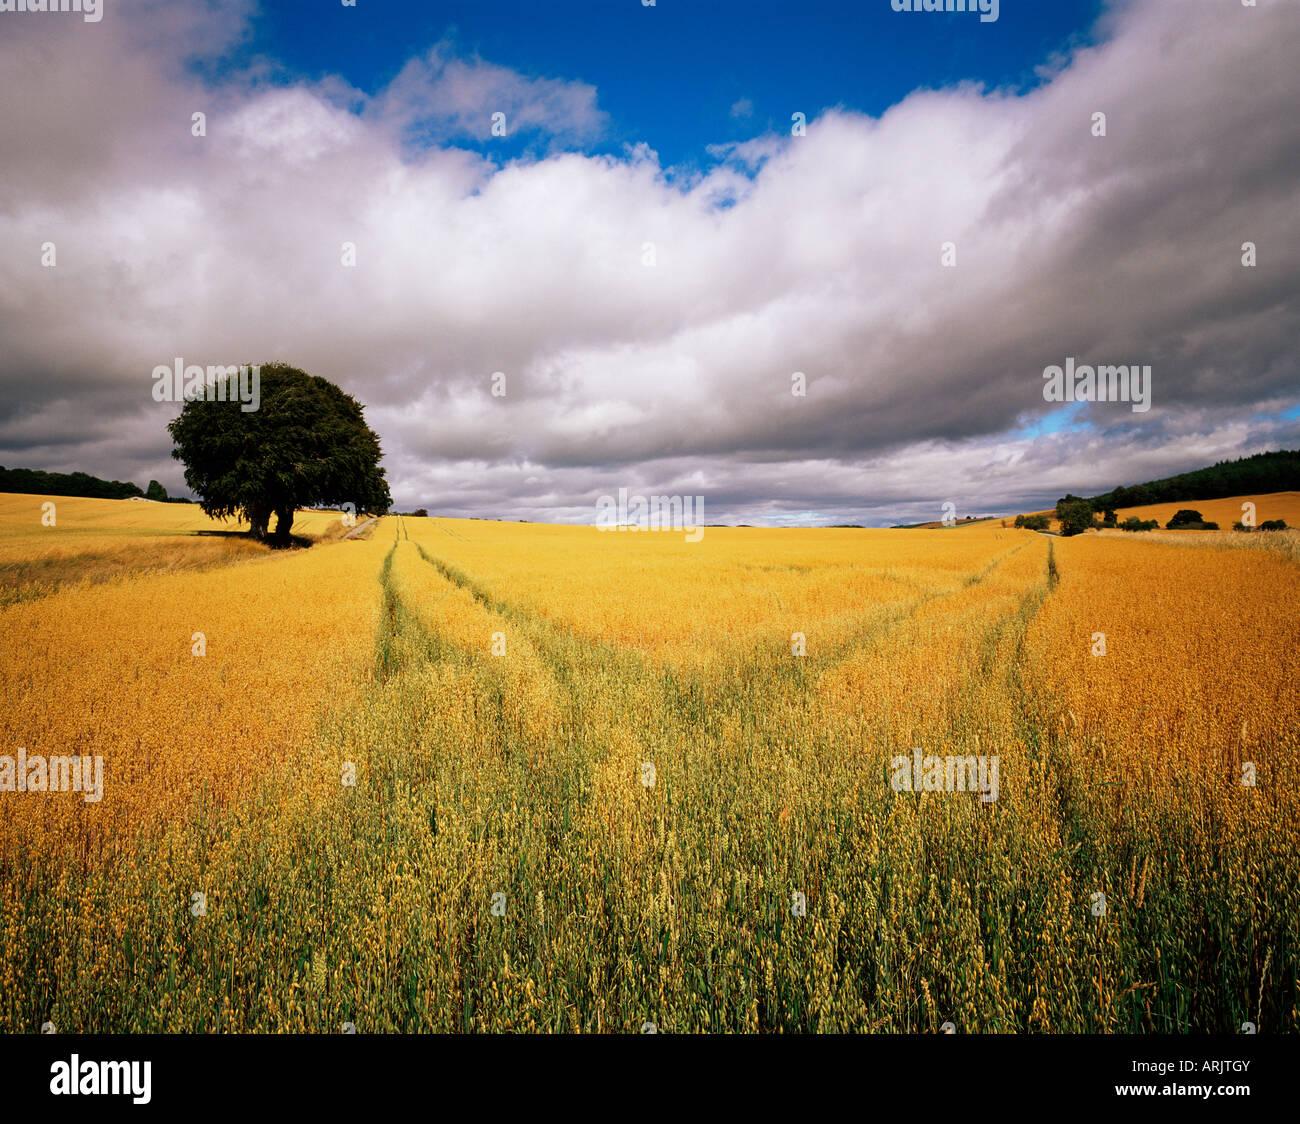 Fields of cereals, near Avoch, Black Isle, Scotland, United Kingdom, Europe - Stock Image